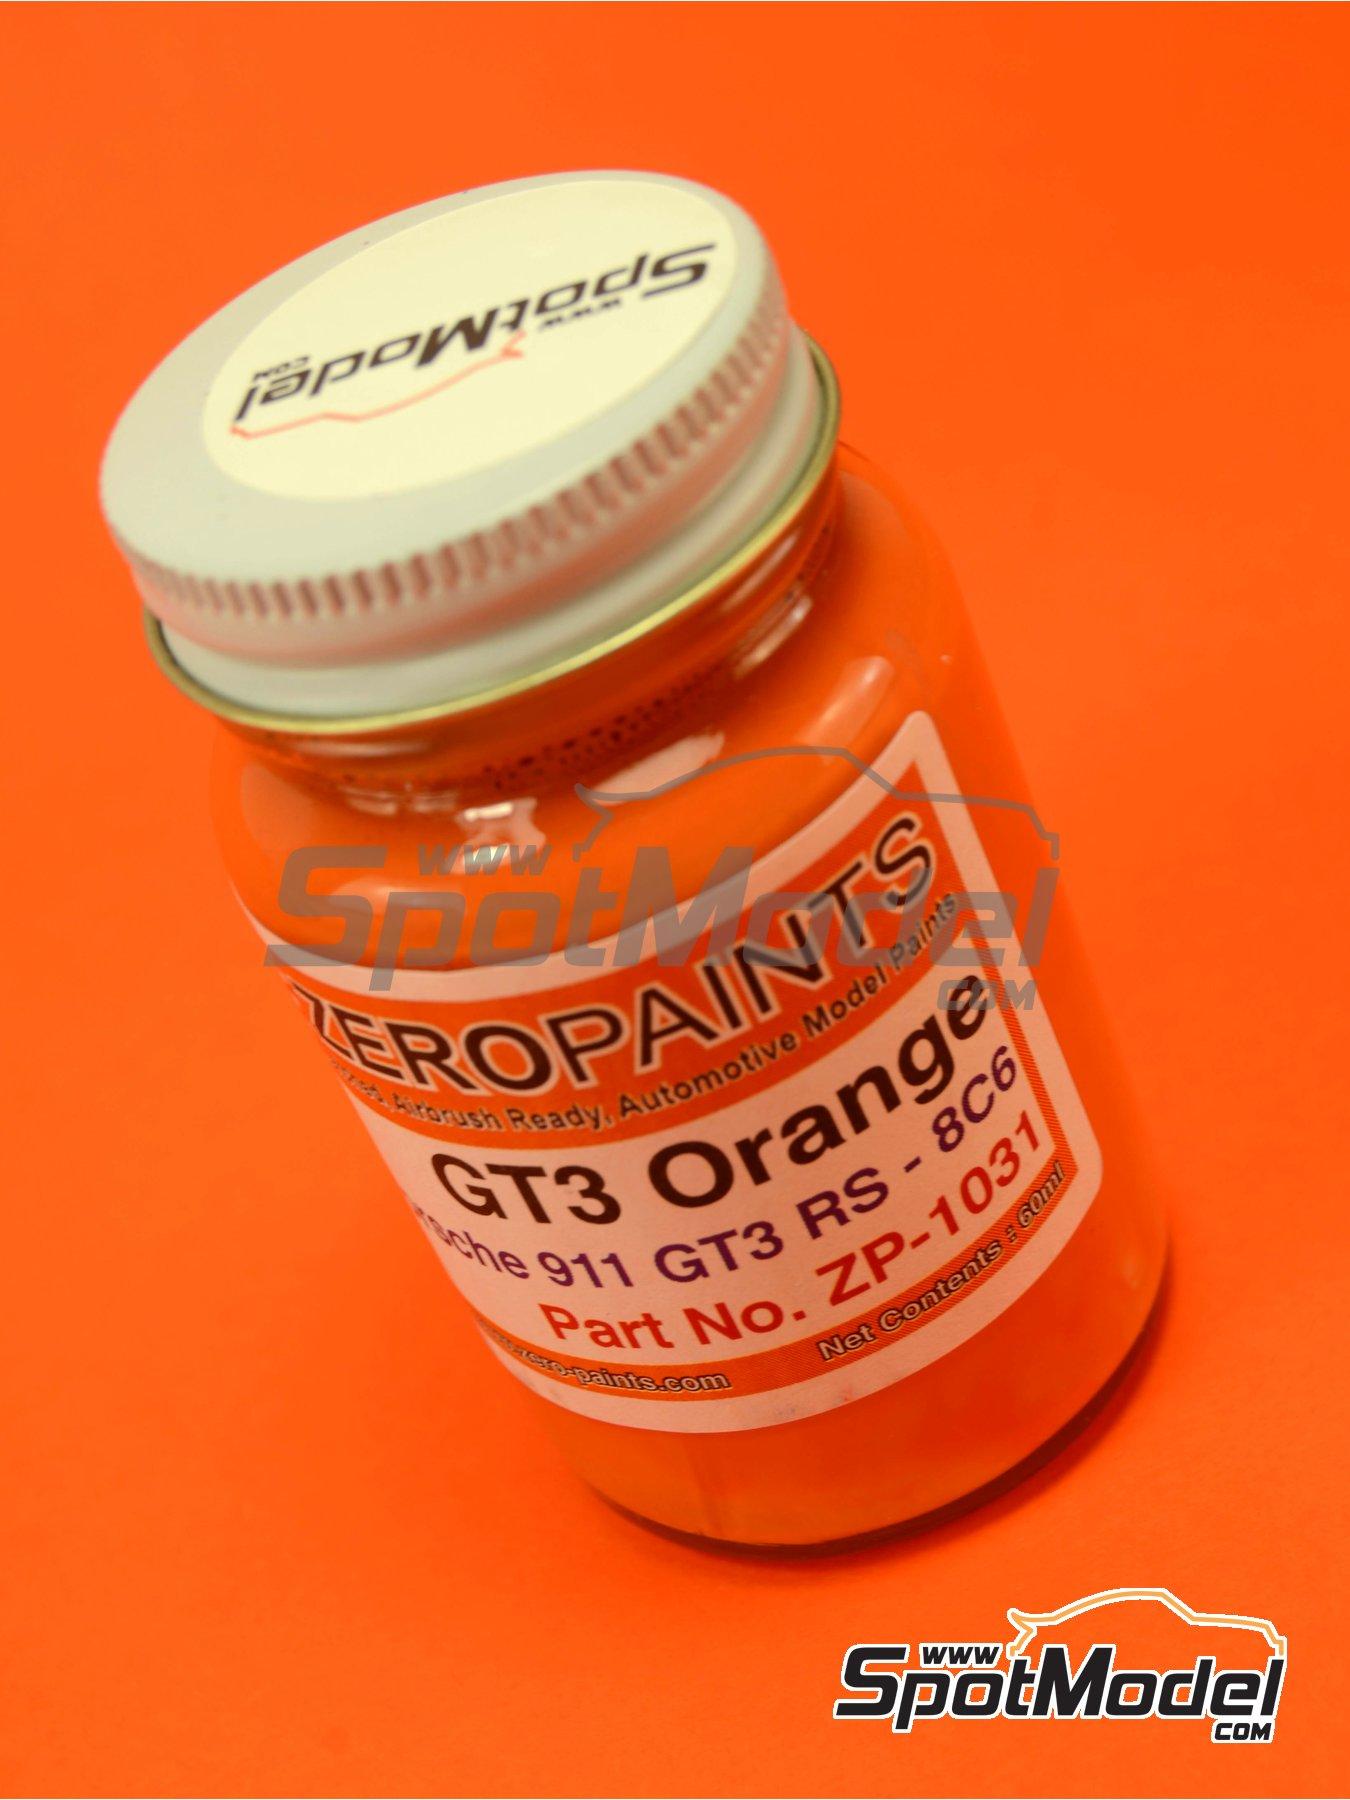 Naranja Porsche Orange GT3 RS Solid - Code: 8C6 - 1 x 60ml | Pintura fabricado por Zero Paints (ref.ZP-1031-8C6) image